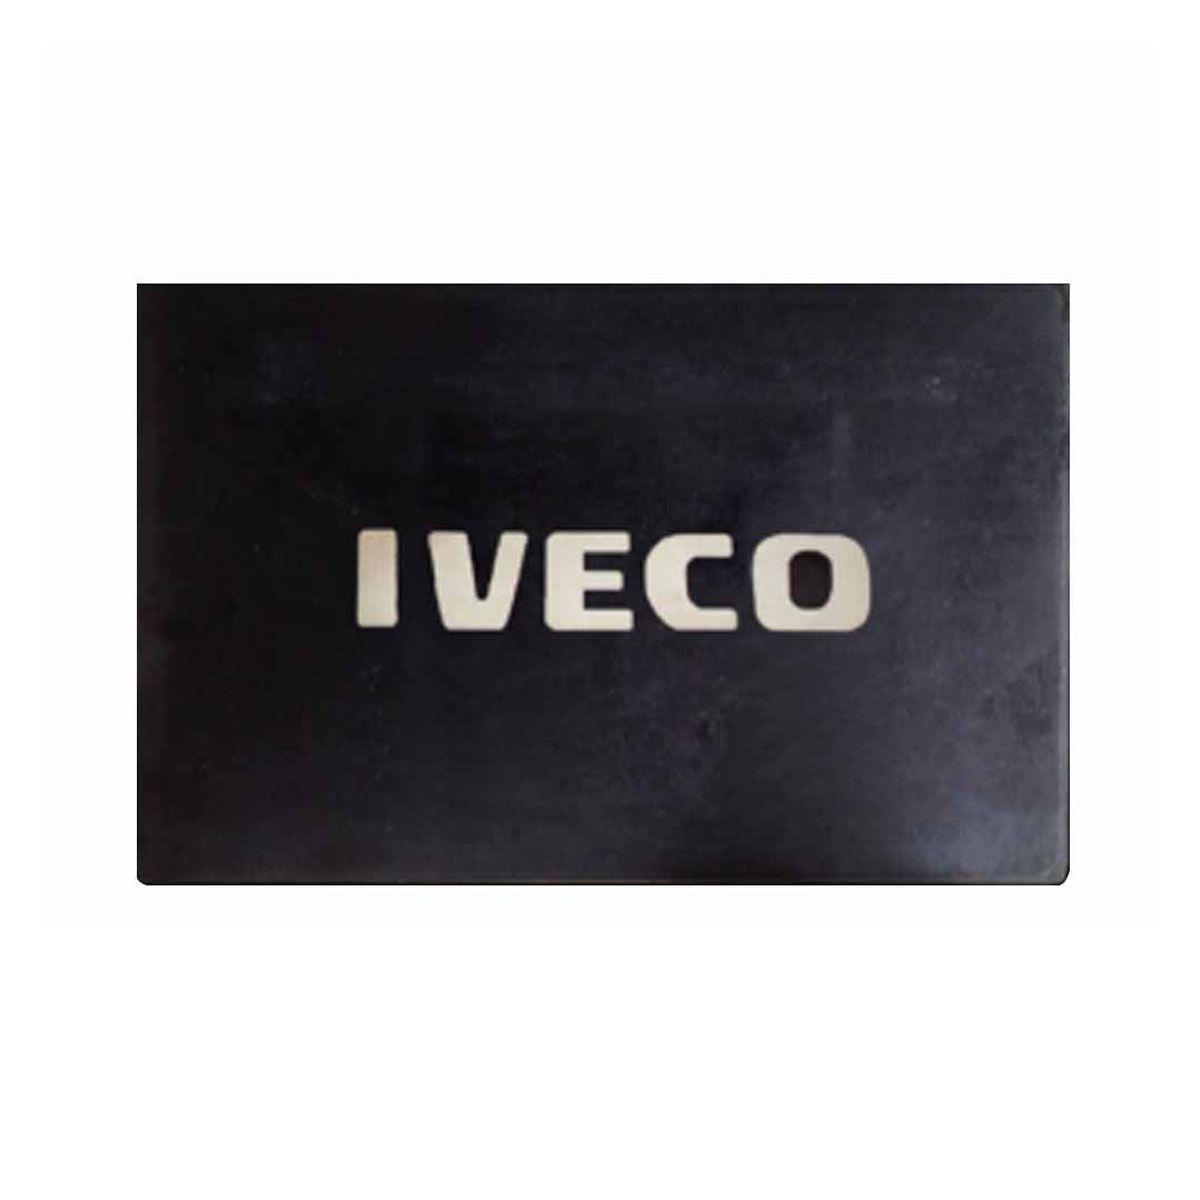 Apara Barro Traseiro Alto Relevo para Iveco (64x35)